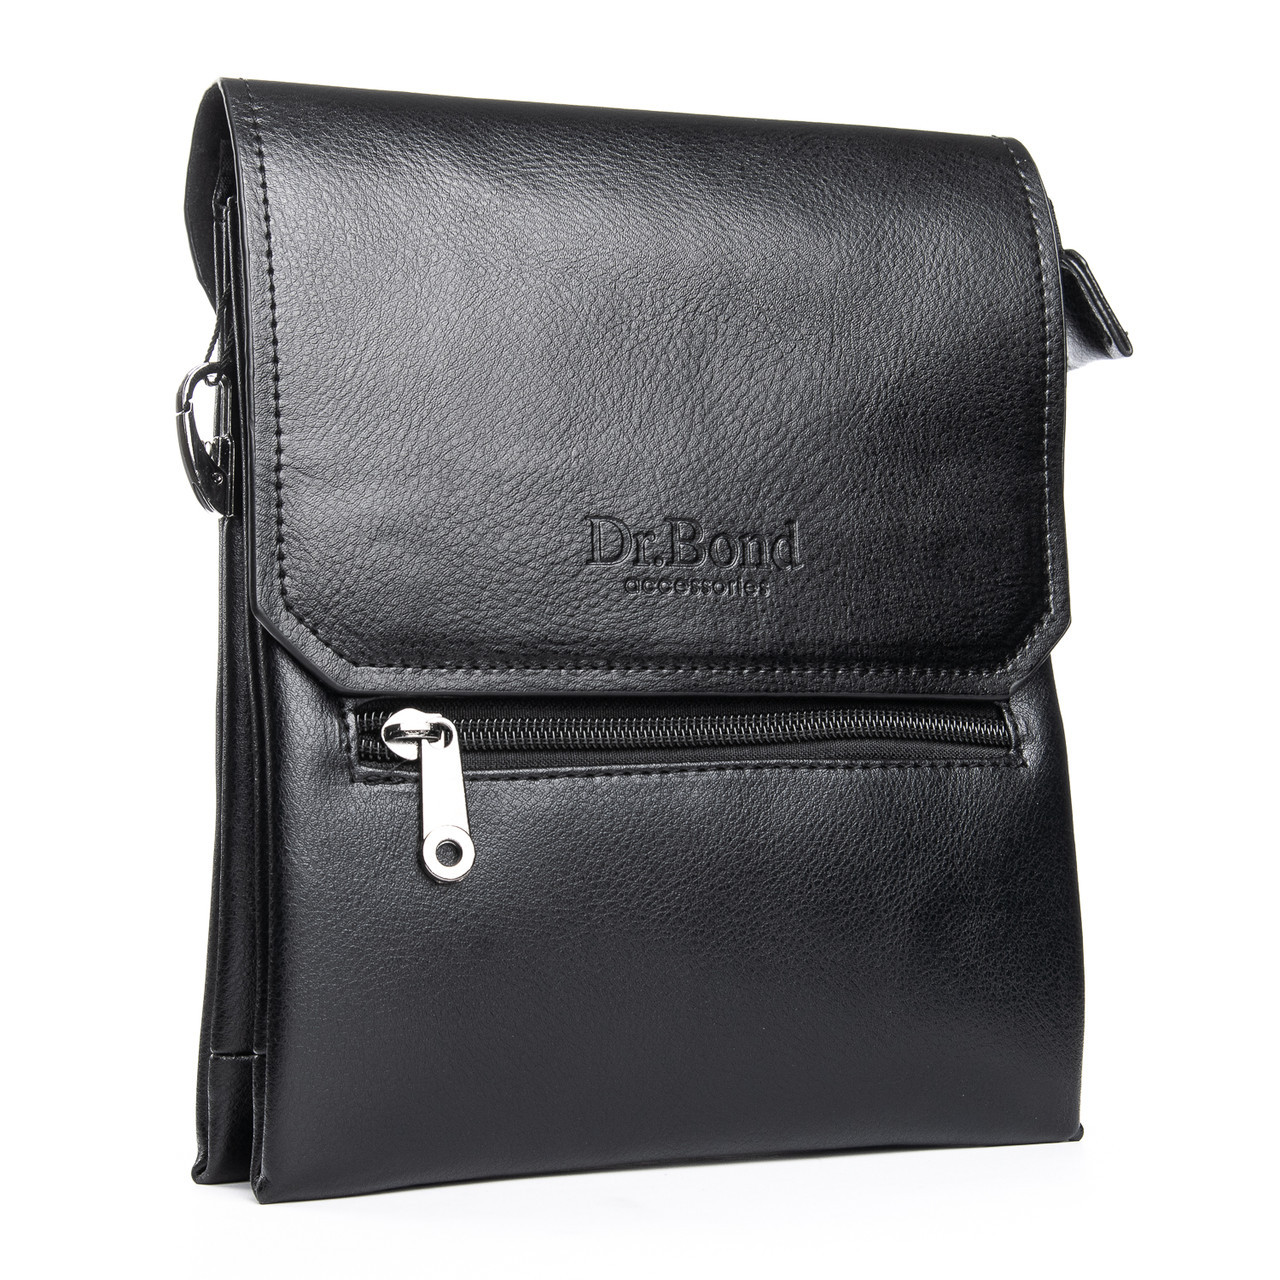 Сумка Мужская Планшет иск-кожа DR. BOND GL 213-2 black